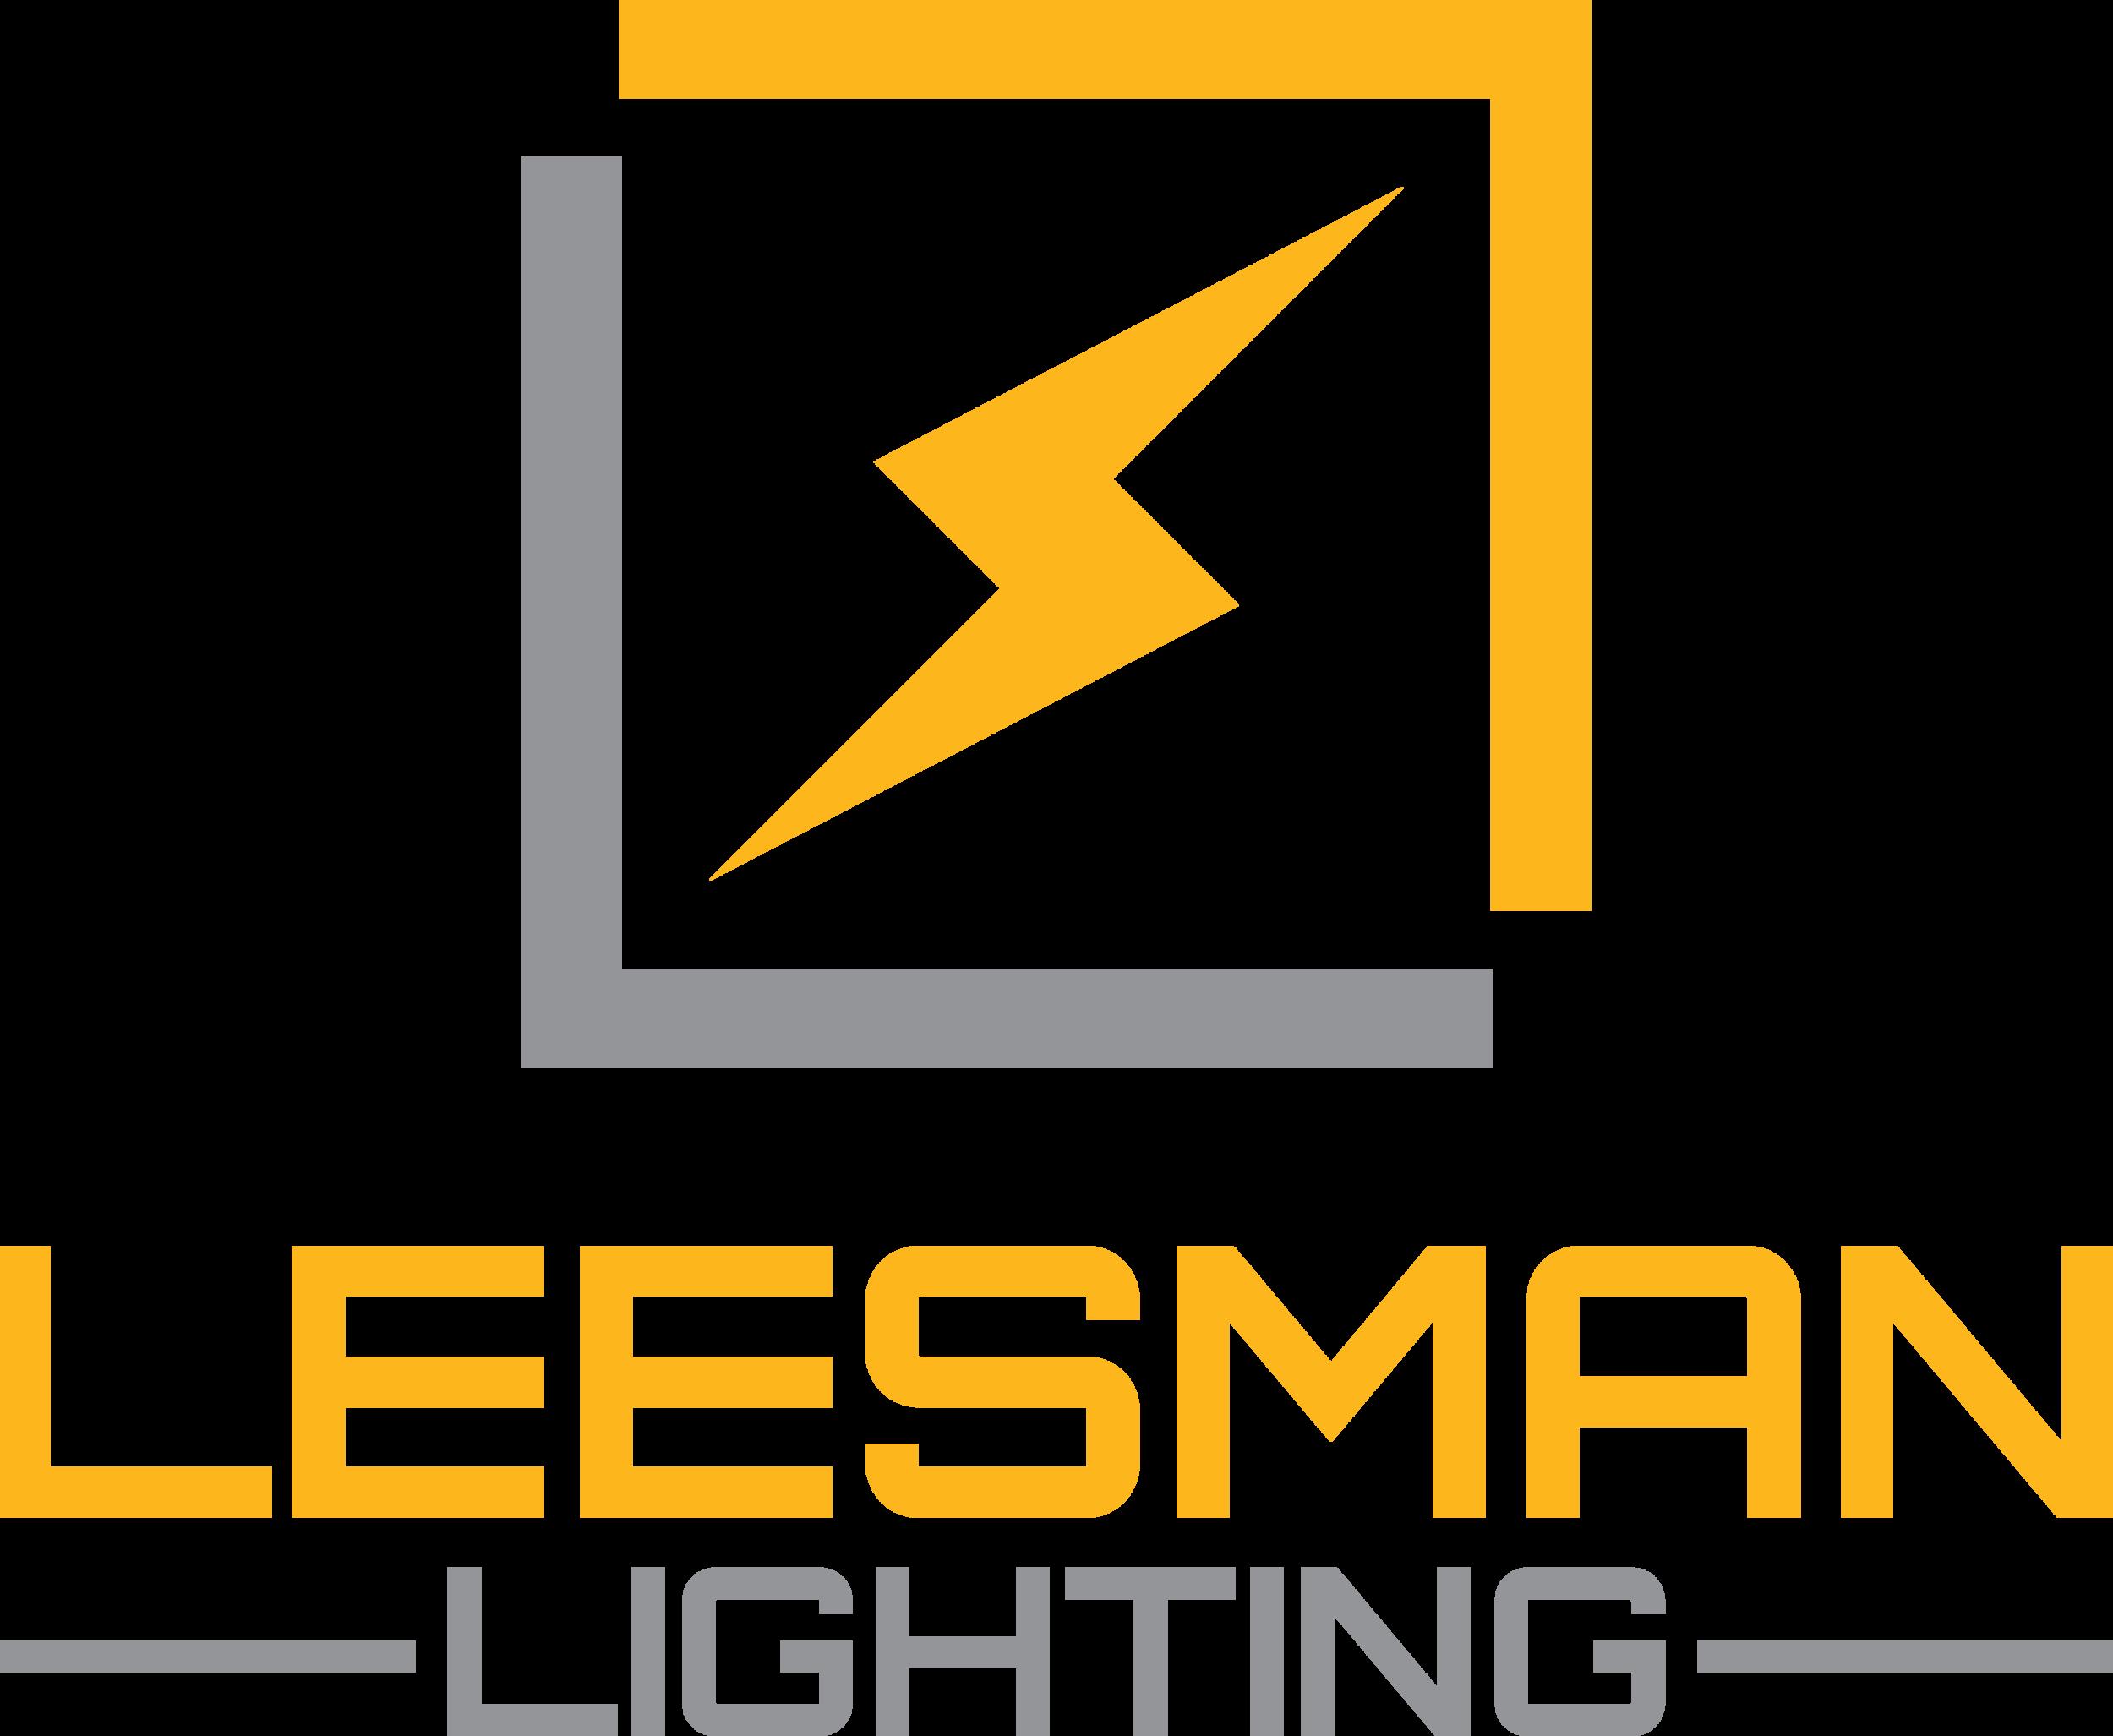 LEESMAN LOGO PNG TRANSPARENT.png